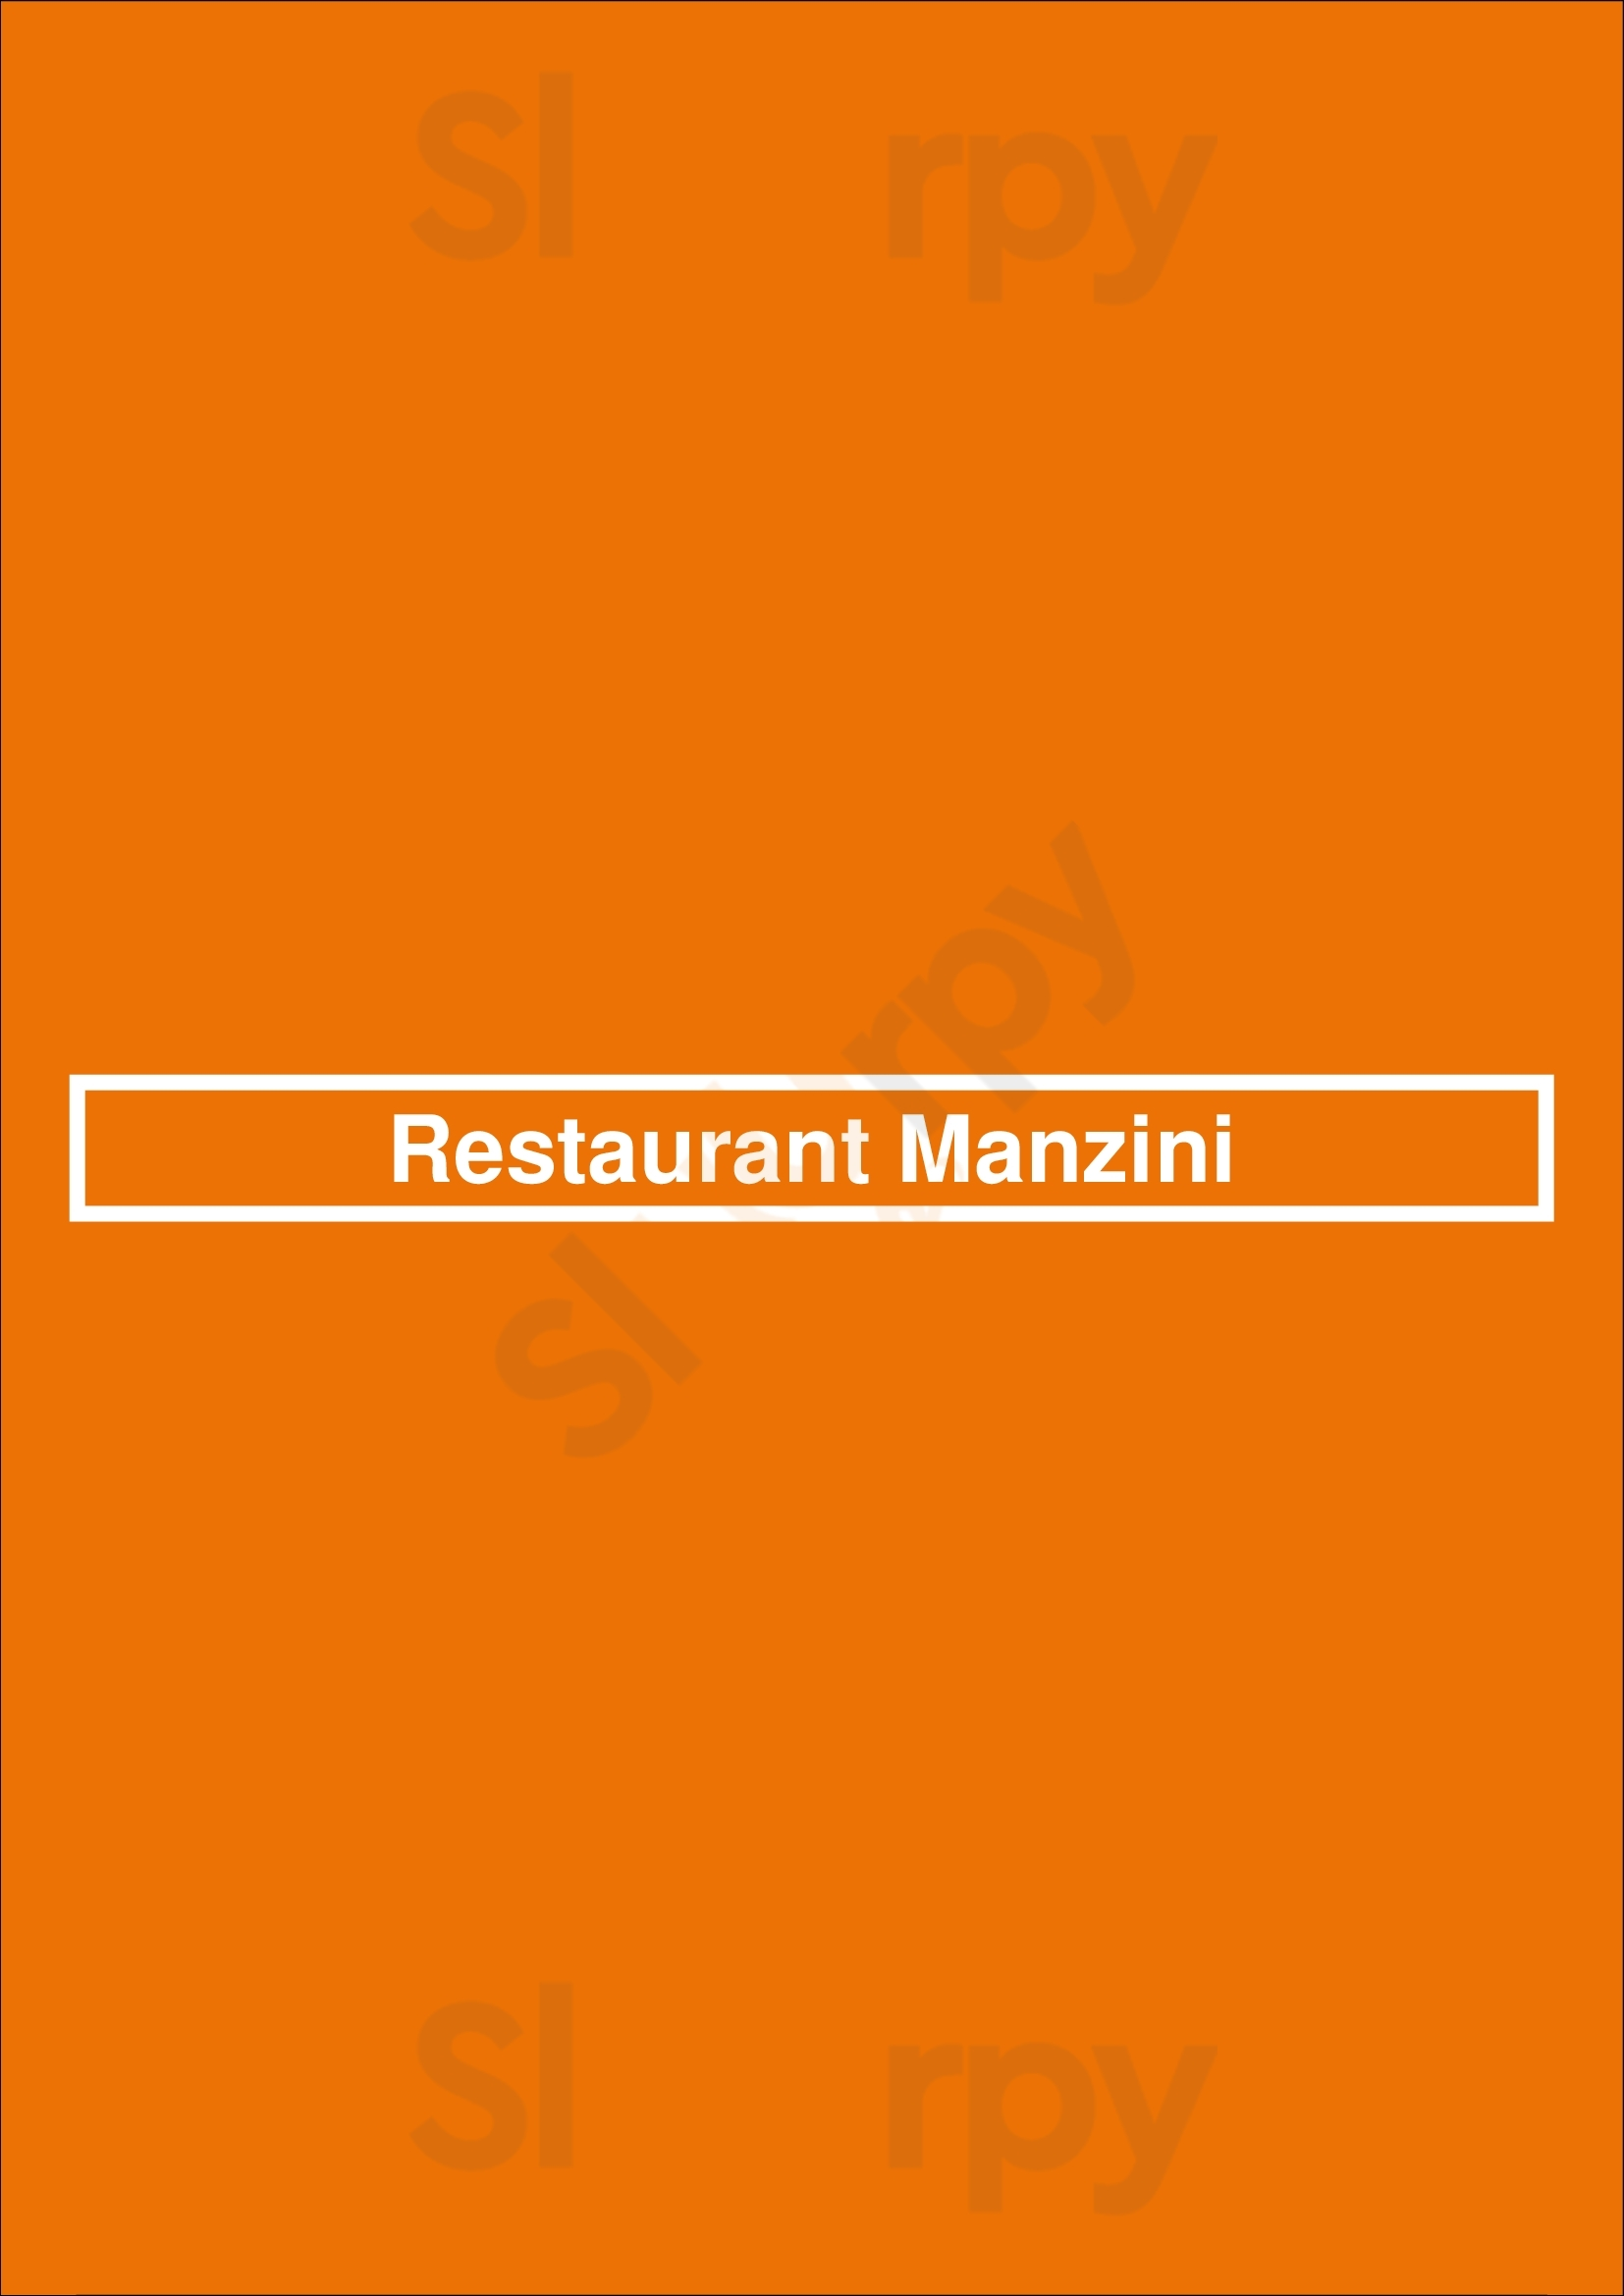 Restaurant Manzini Berlin menù - pagina 1